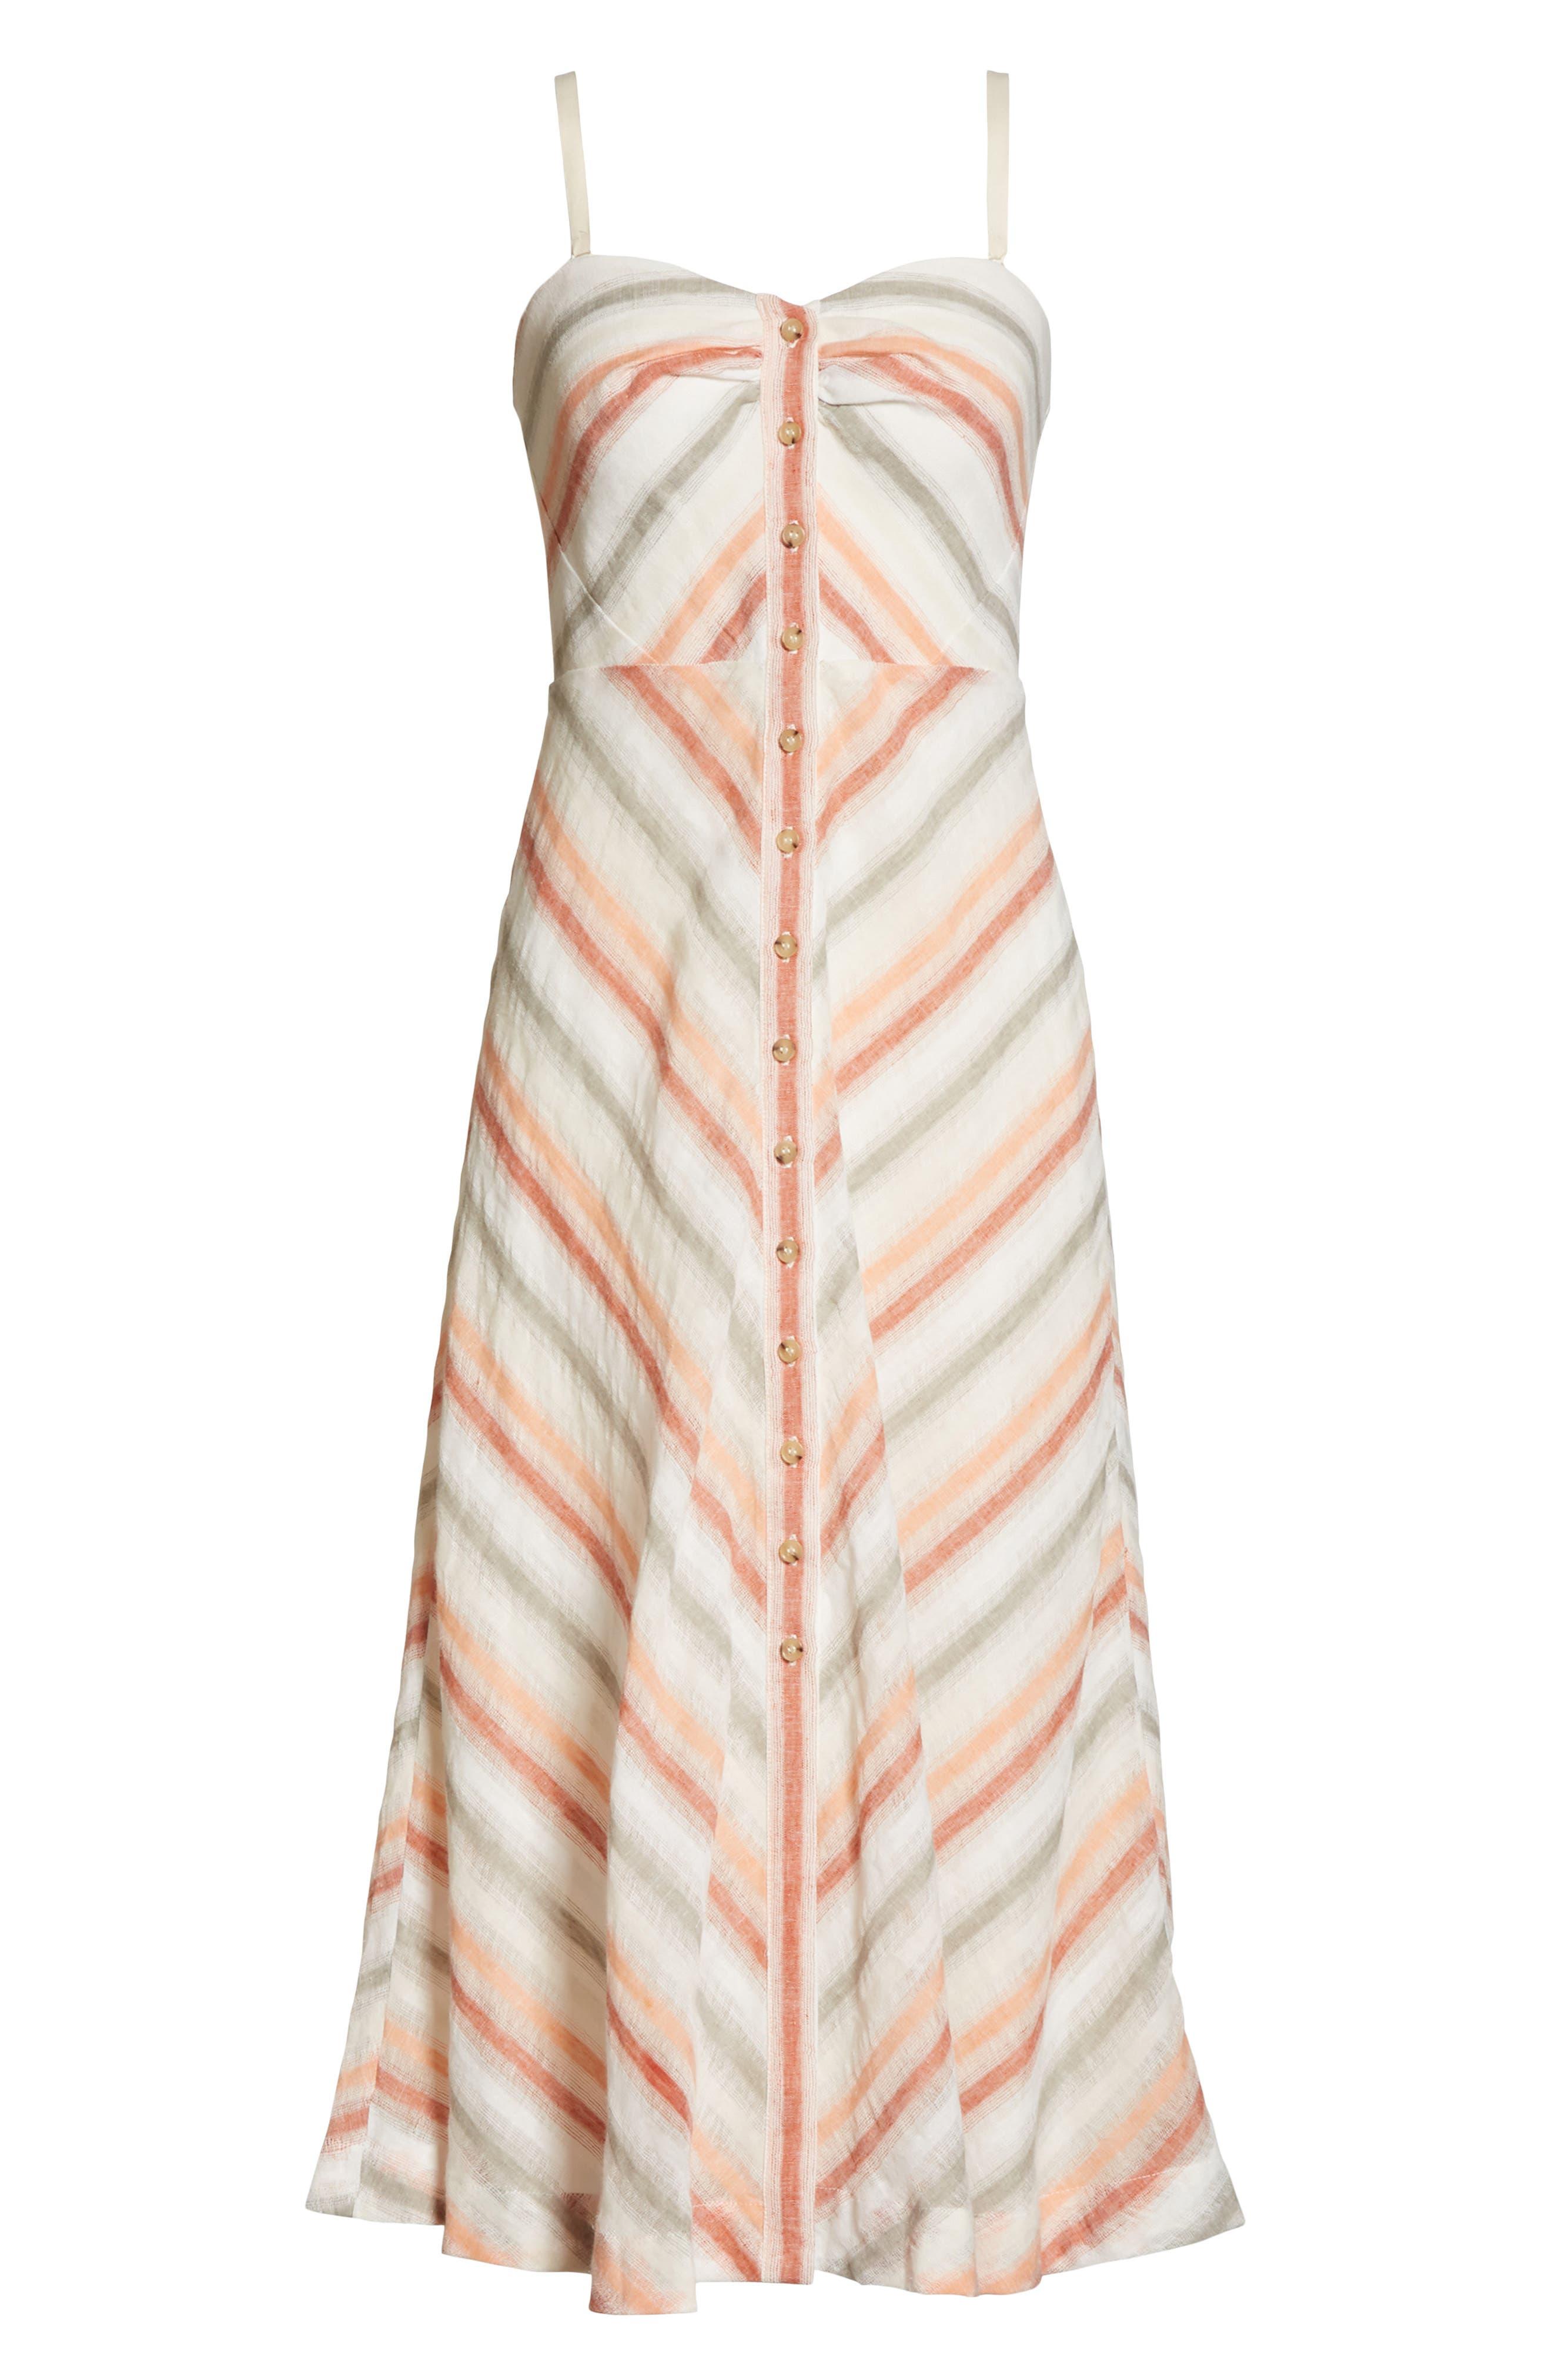 Striking Stripe Midi Dress,                             Alternate thumbnail 7, color,                             903